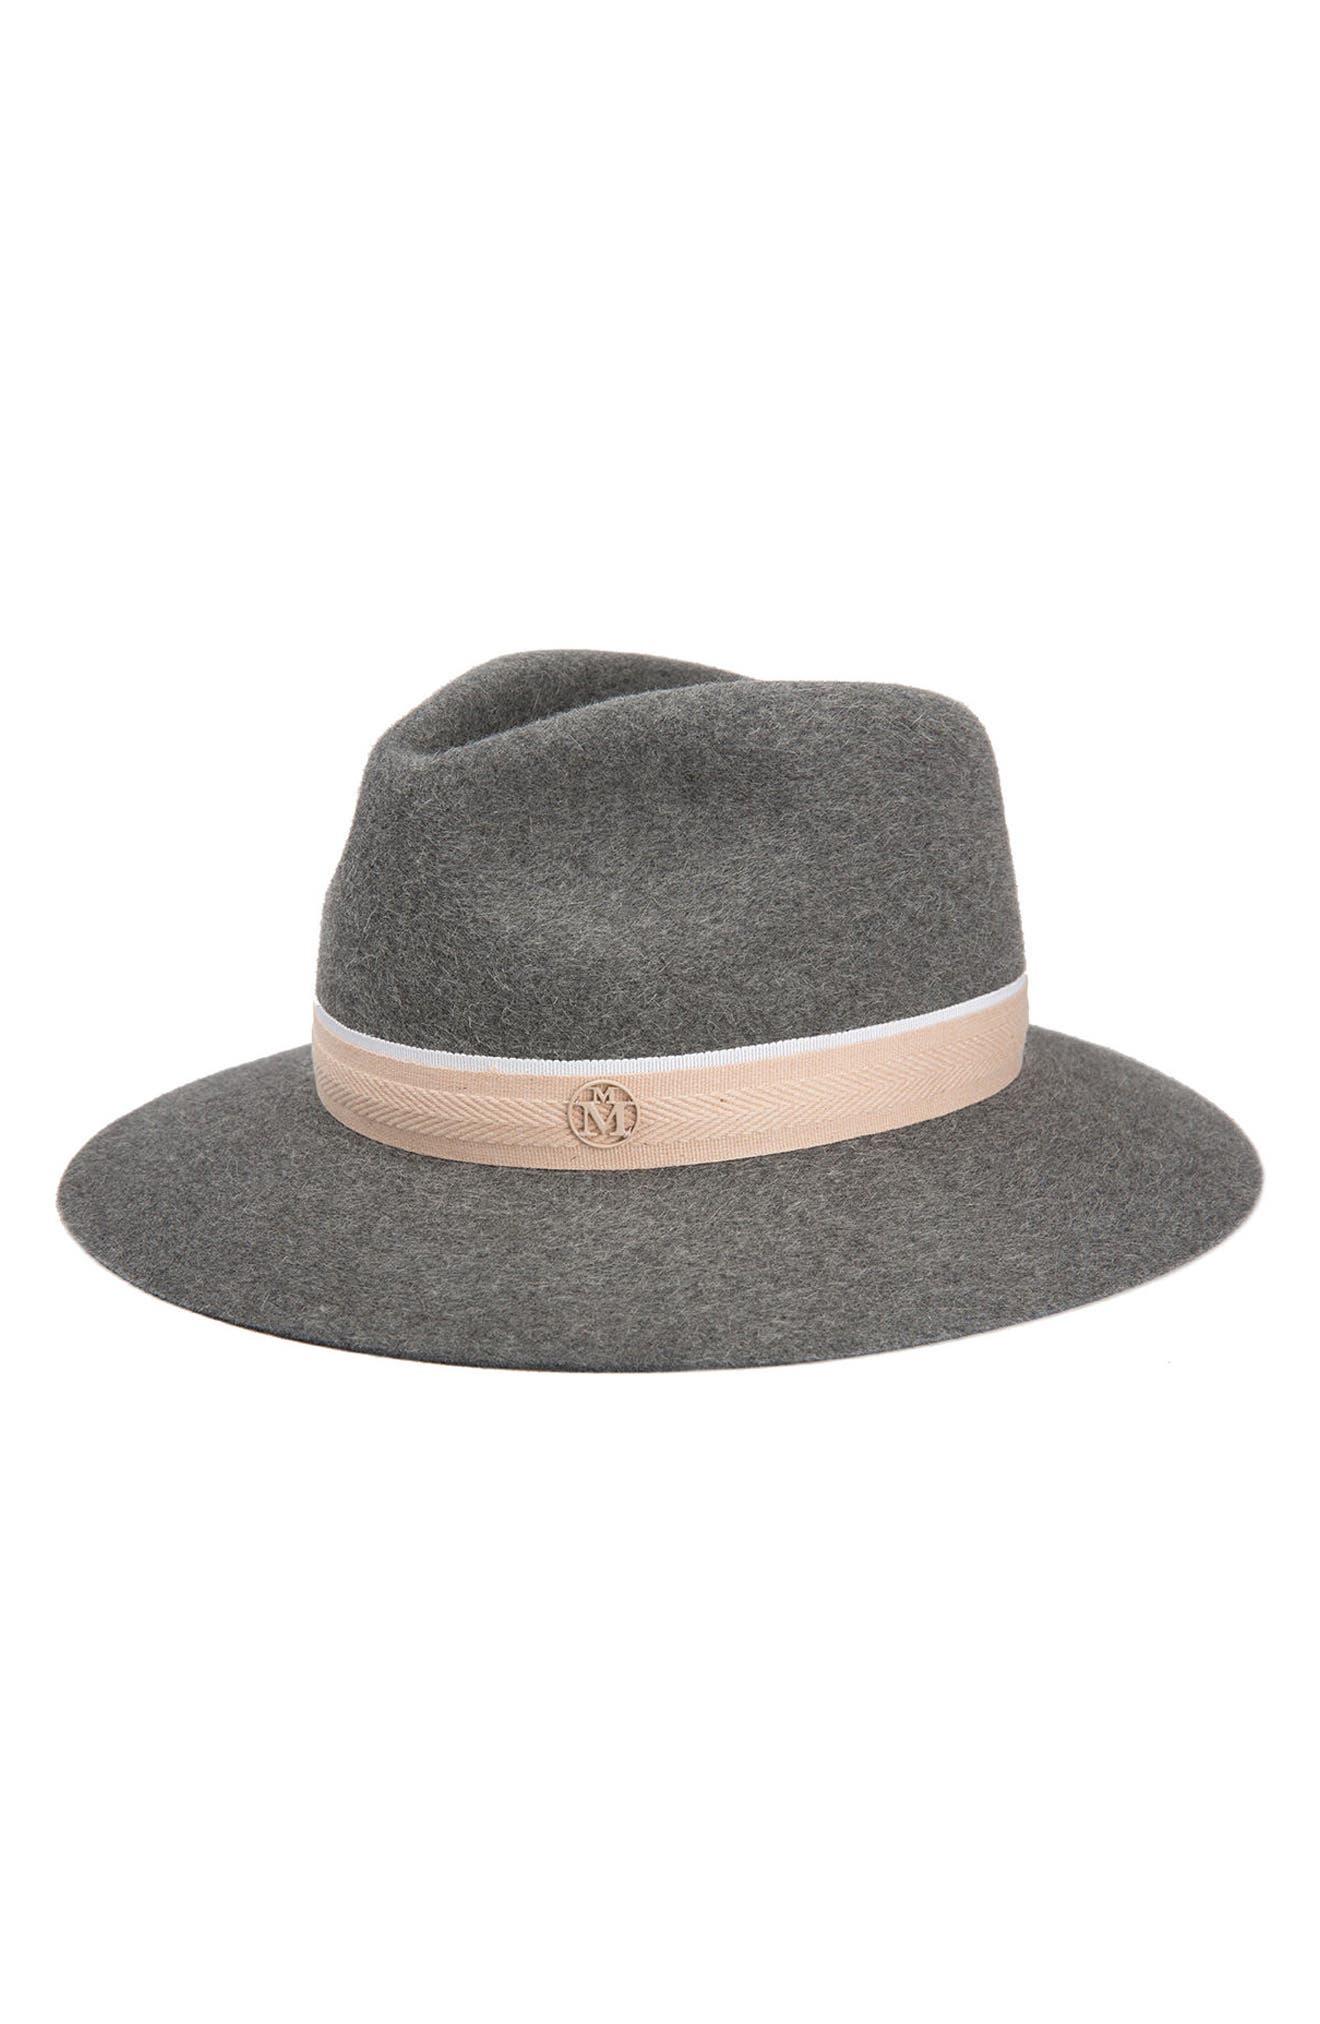 Rico Fur Felt Hat,                         Main,                         color, 020